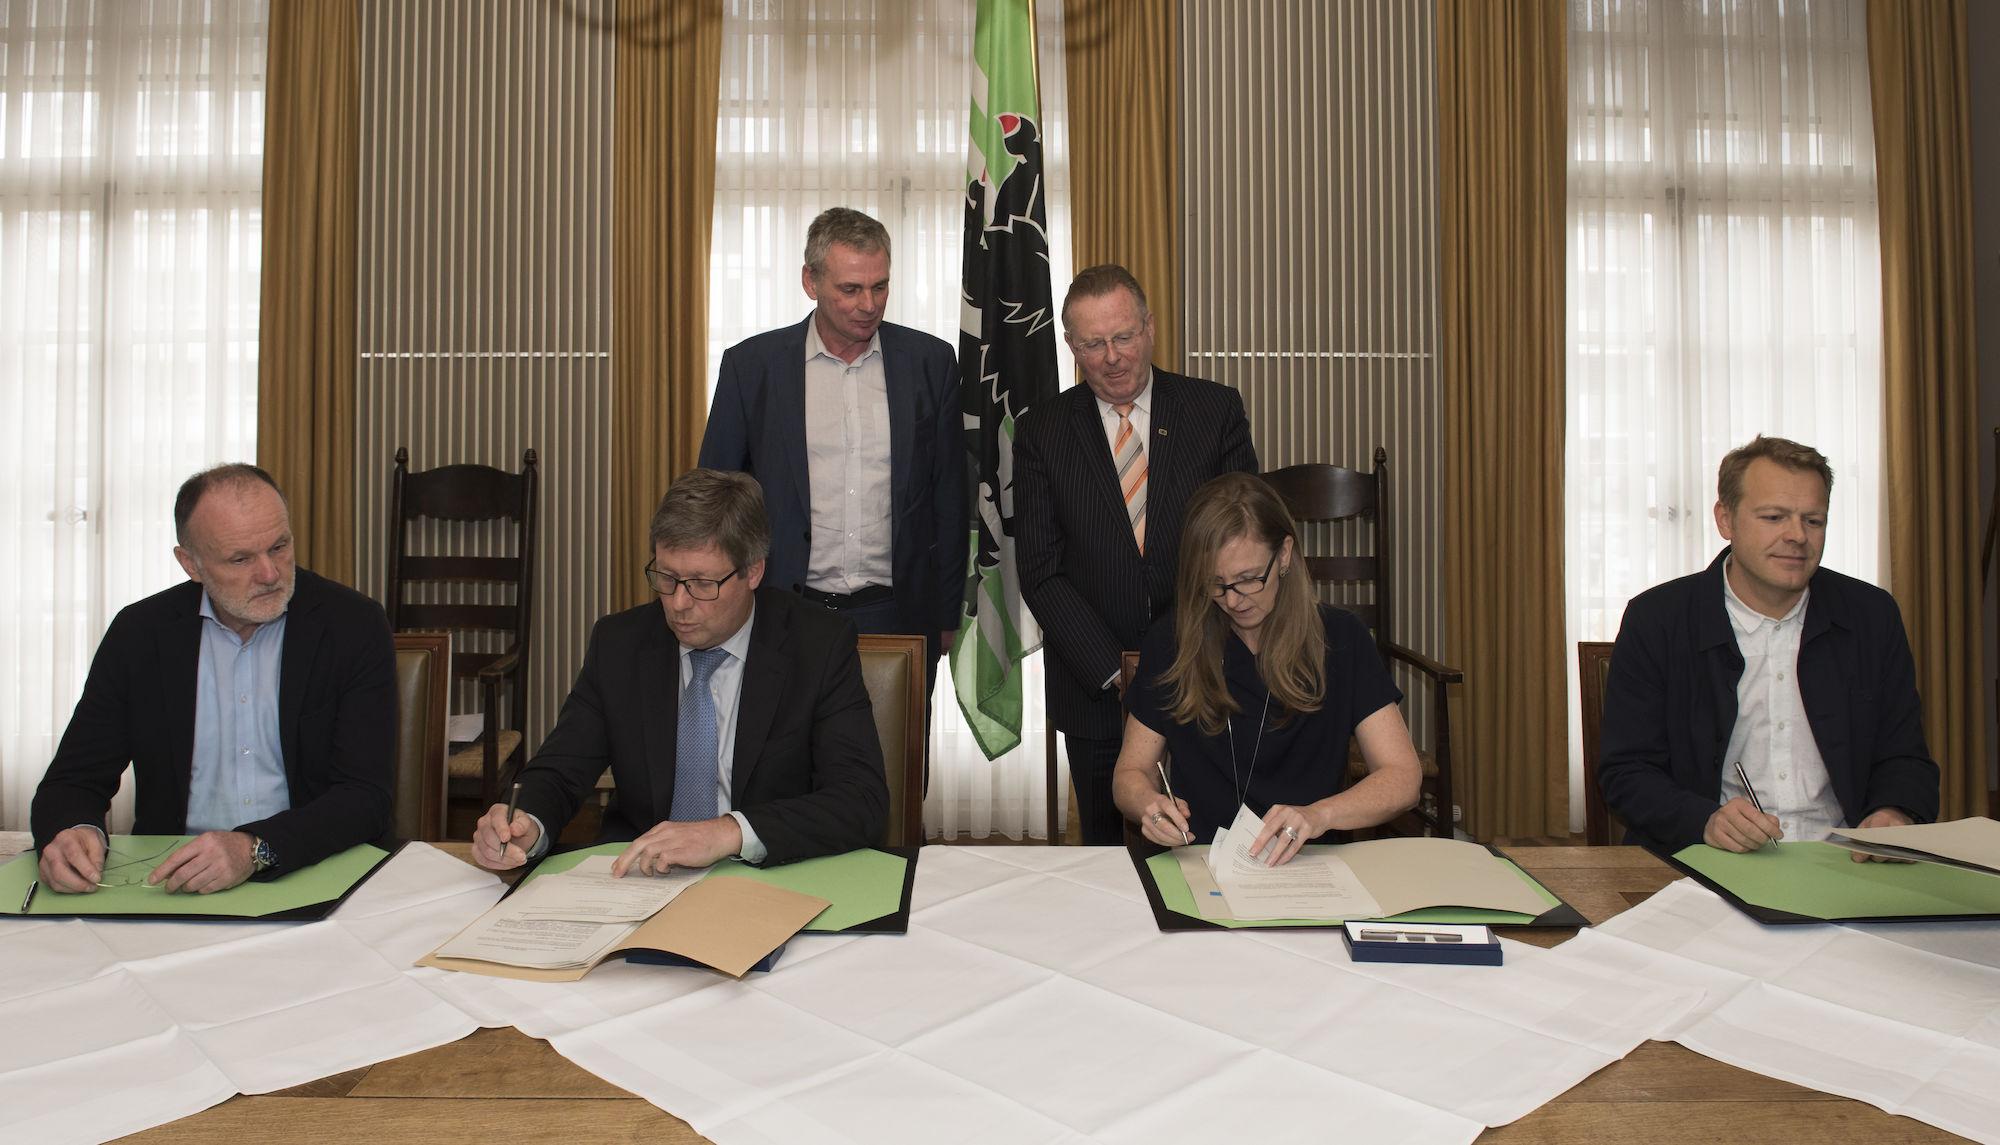 180309-ondertekening-overeenkomst-realisatie-Leopoldskazerne-00001.jpg